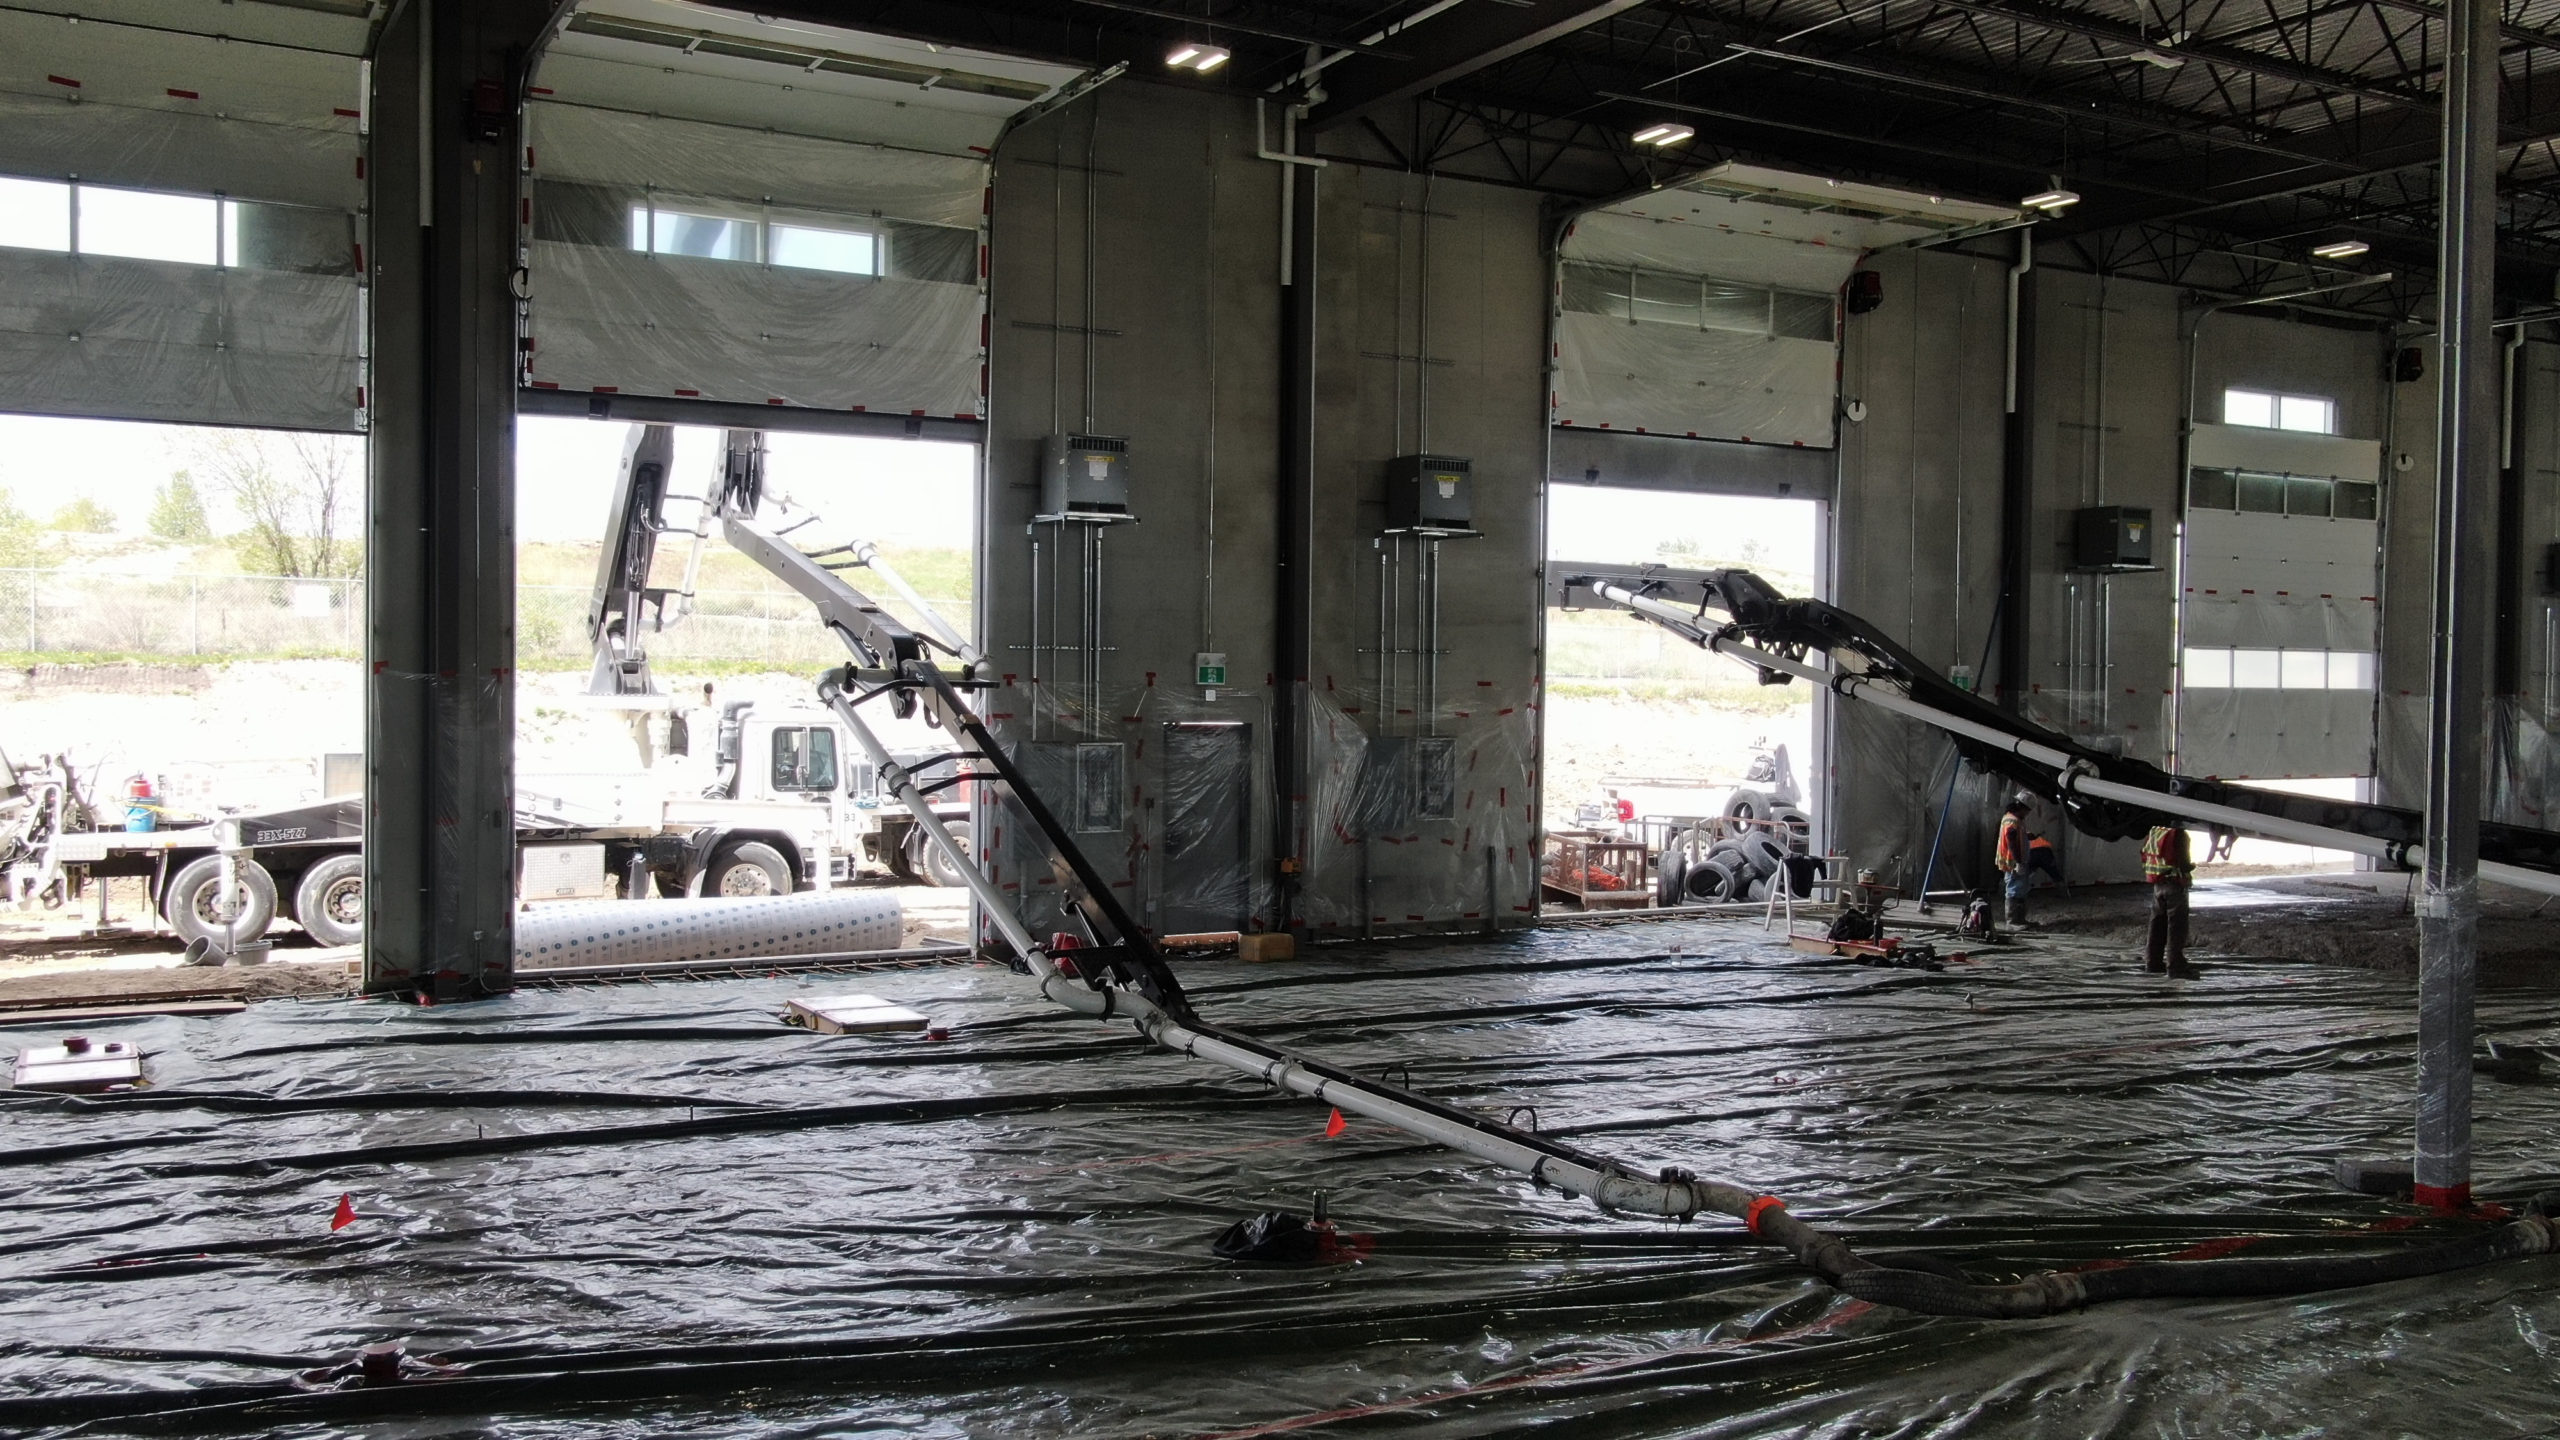 concrete boom pumps pumping concrete into the HF11 industrial condo development